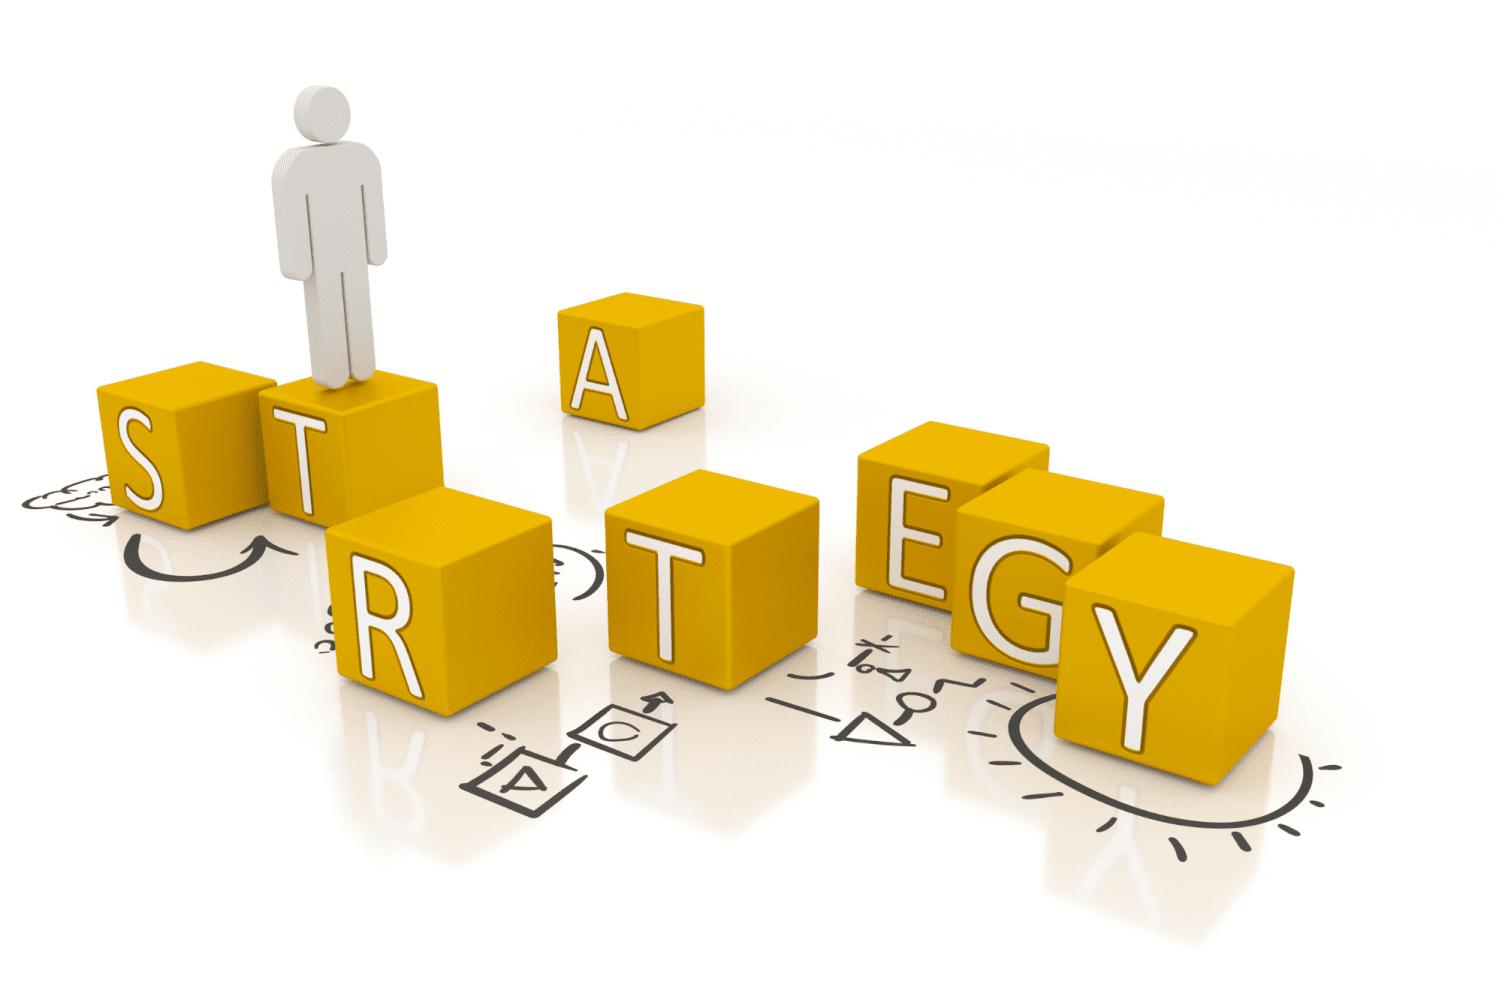 Whitepaper_Moneypenny_Thuiswerken_inzetten_als_strategische_tool_versie_14_mei_2021